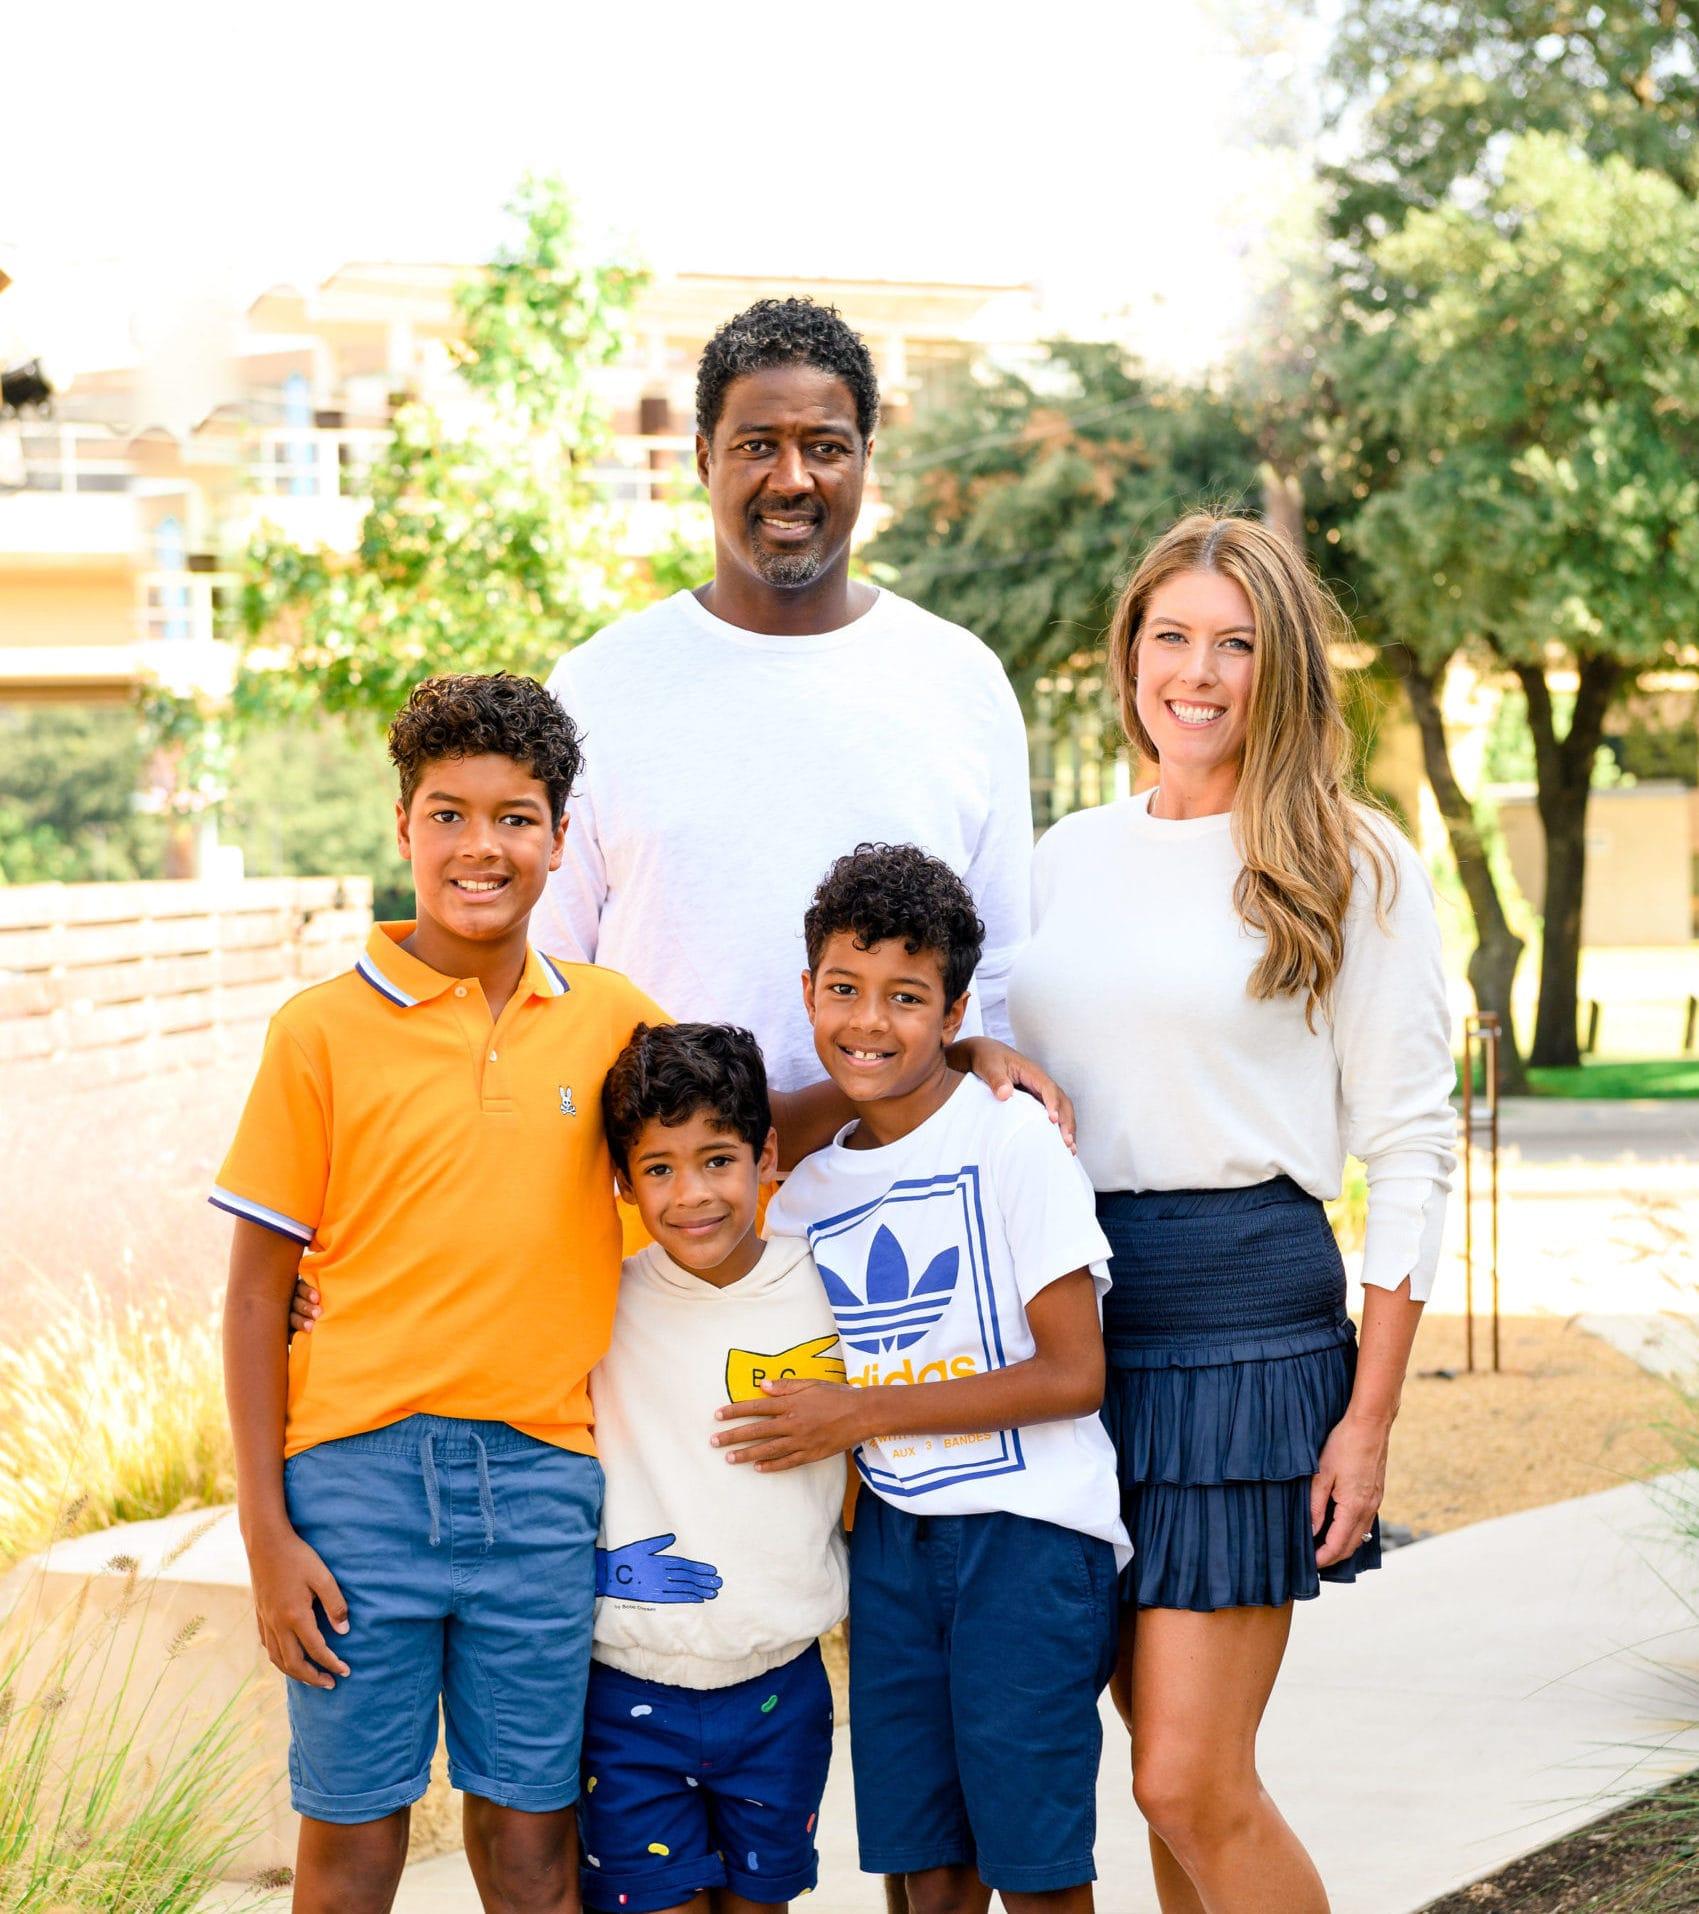 paula brunson with her family